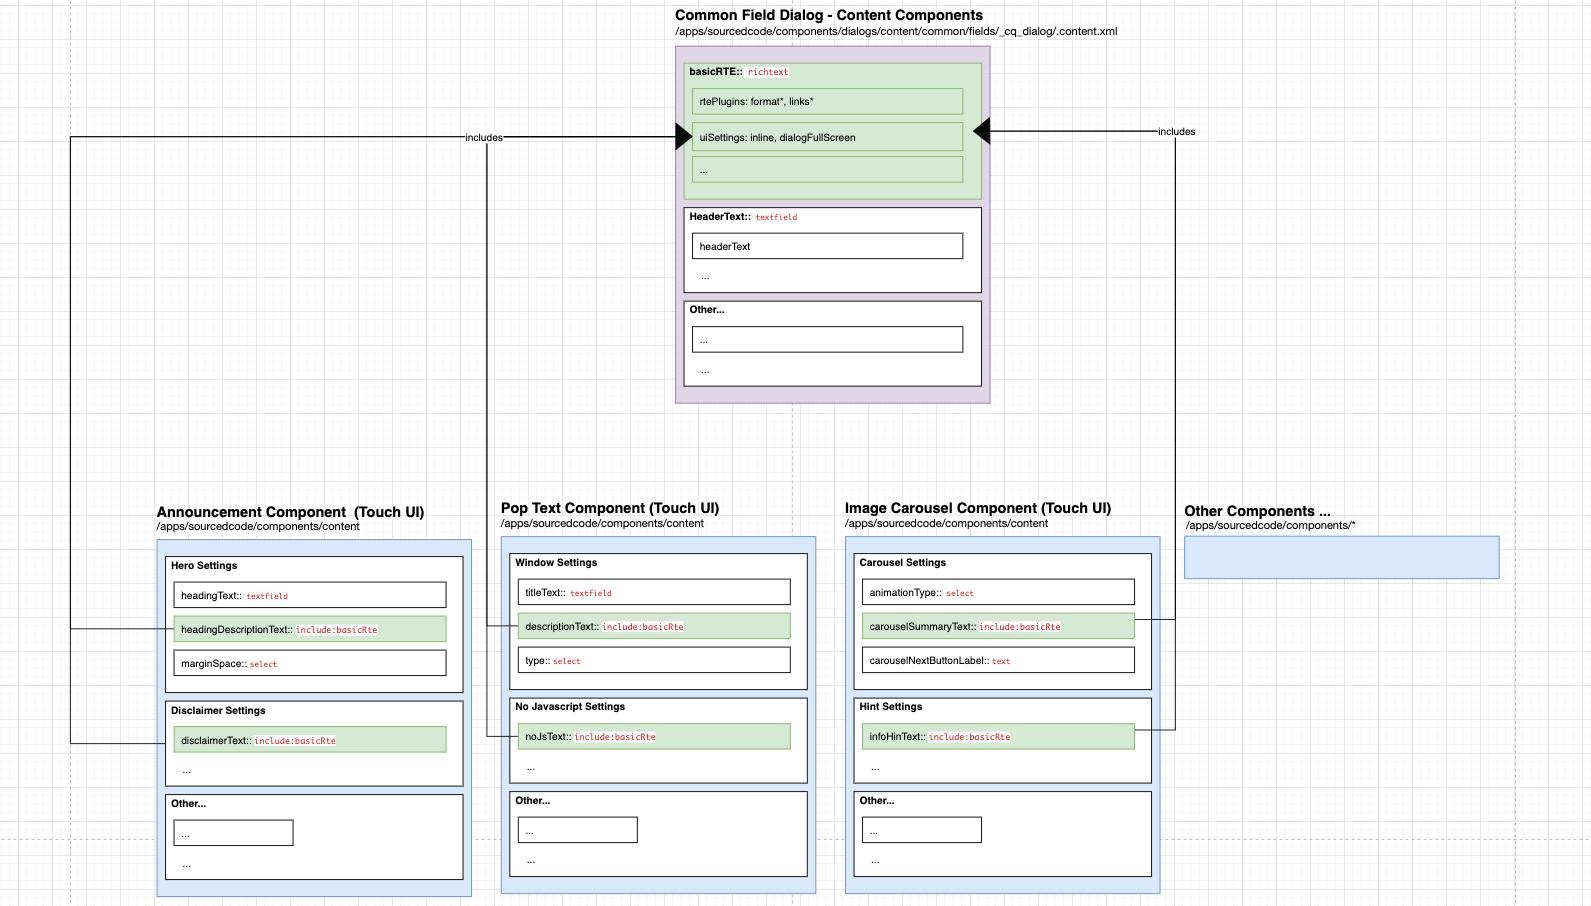 Multiple AEM components' Touch UI dialogue utilises the common Granite UI component configuration in the JCR, for the richtext Granite UI component configurations.